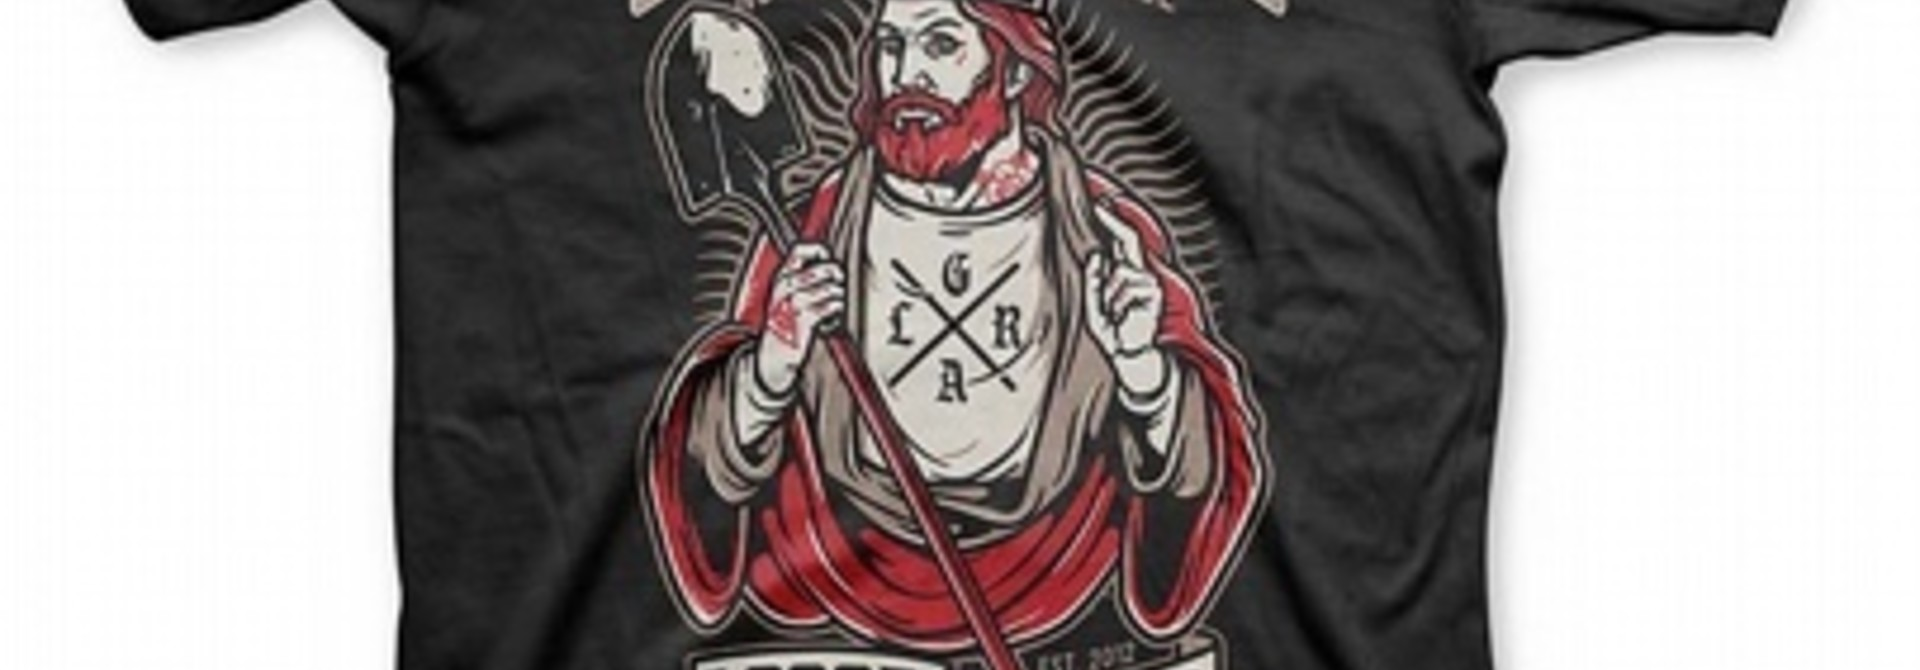 Loose Riders T-Shirt - Mens